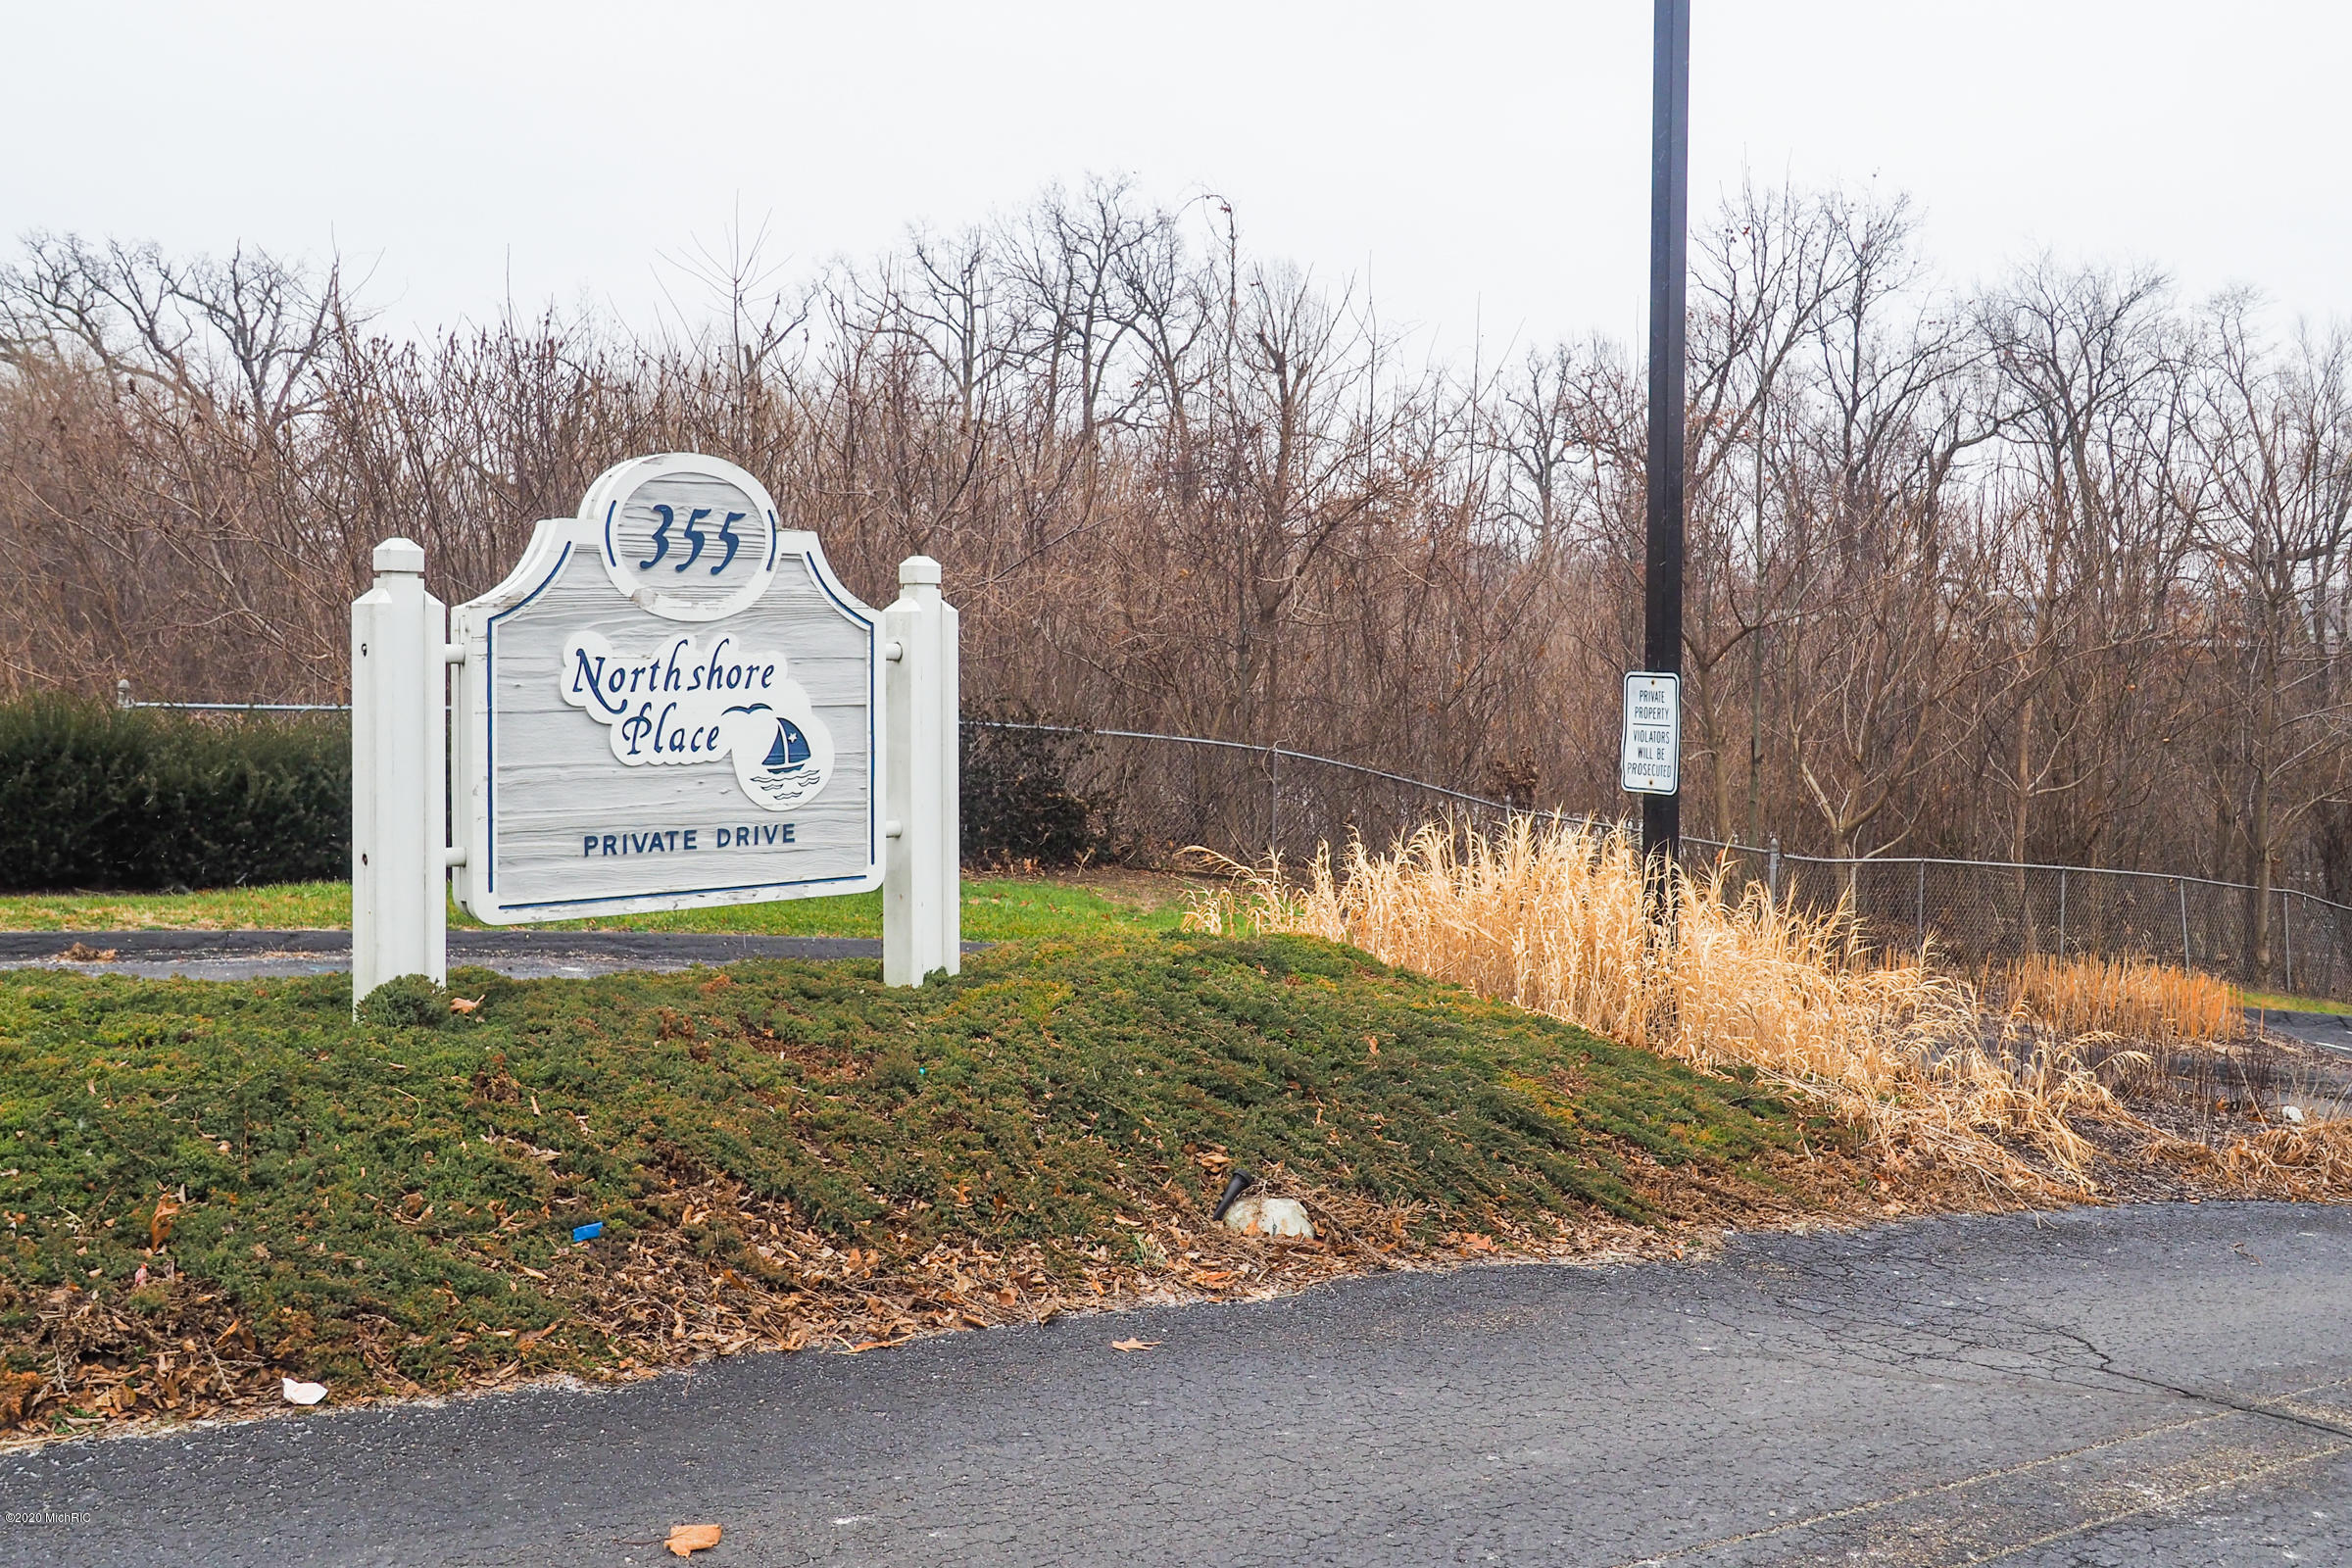 355 W Columbia Ave 101, Battle Creek, MI 49015 Photo 2